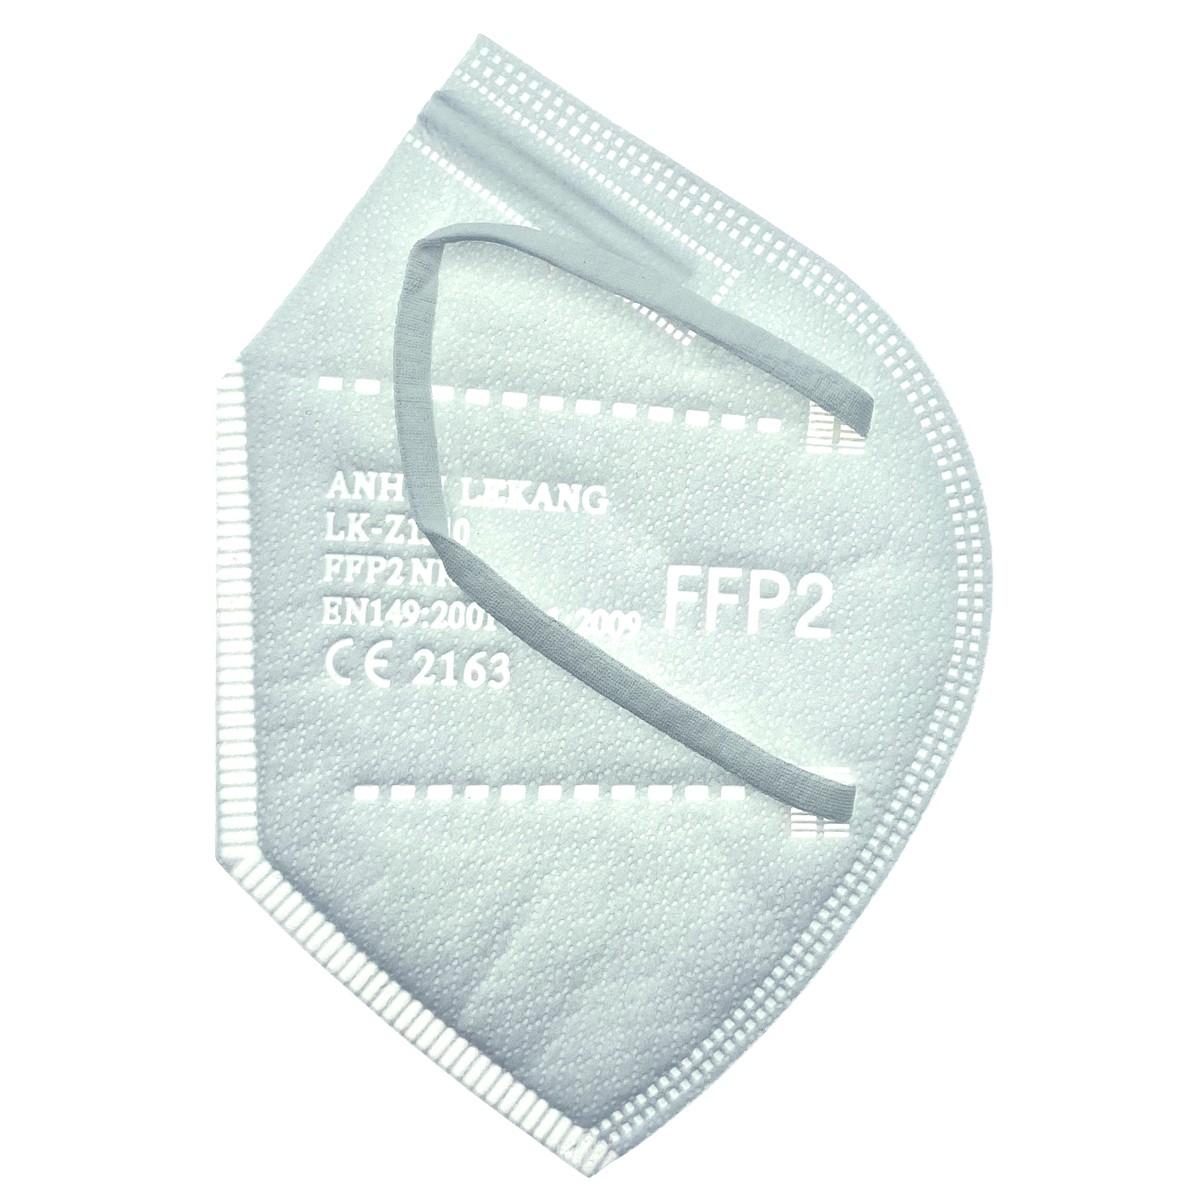 Mascarillas FFP2 CE2163 Desechables Adulto 20 uds LK-Z1510